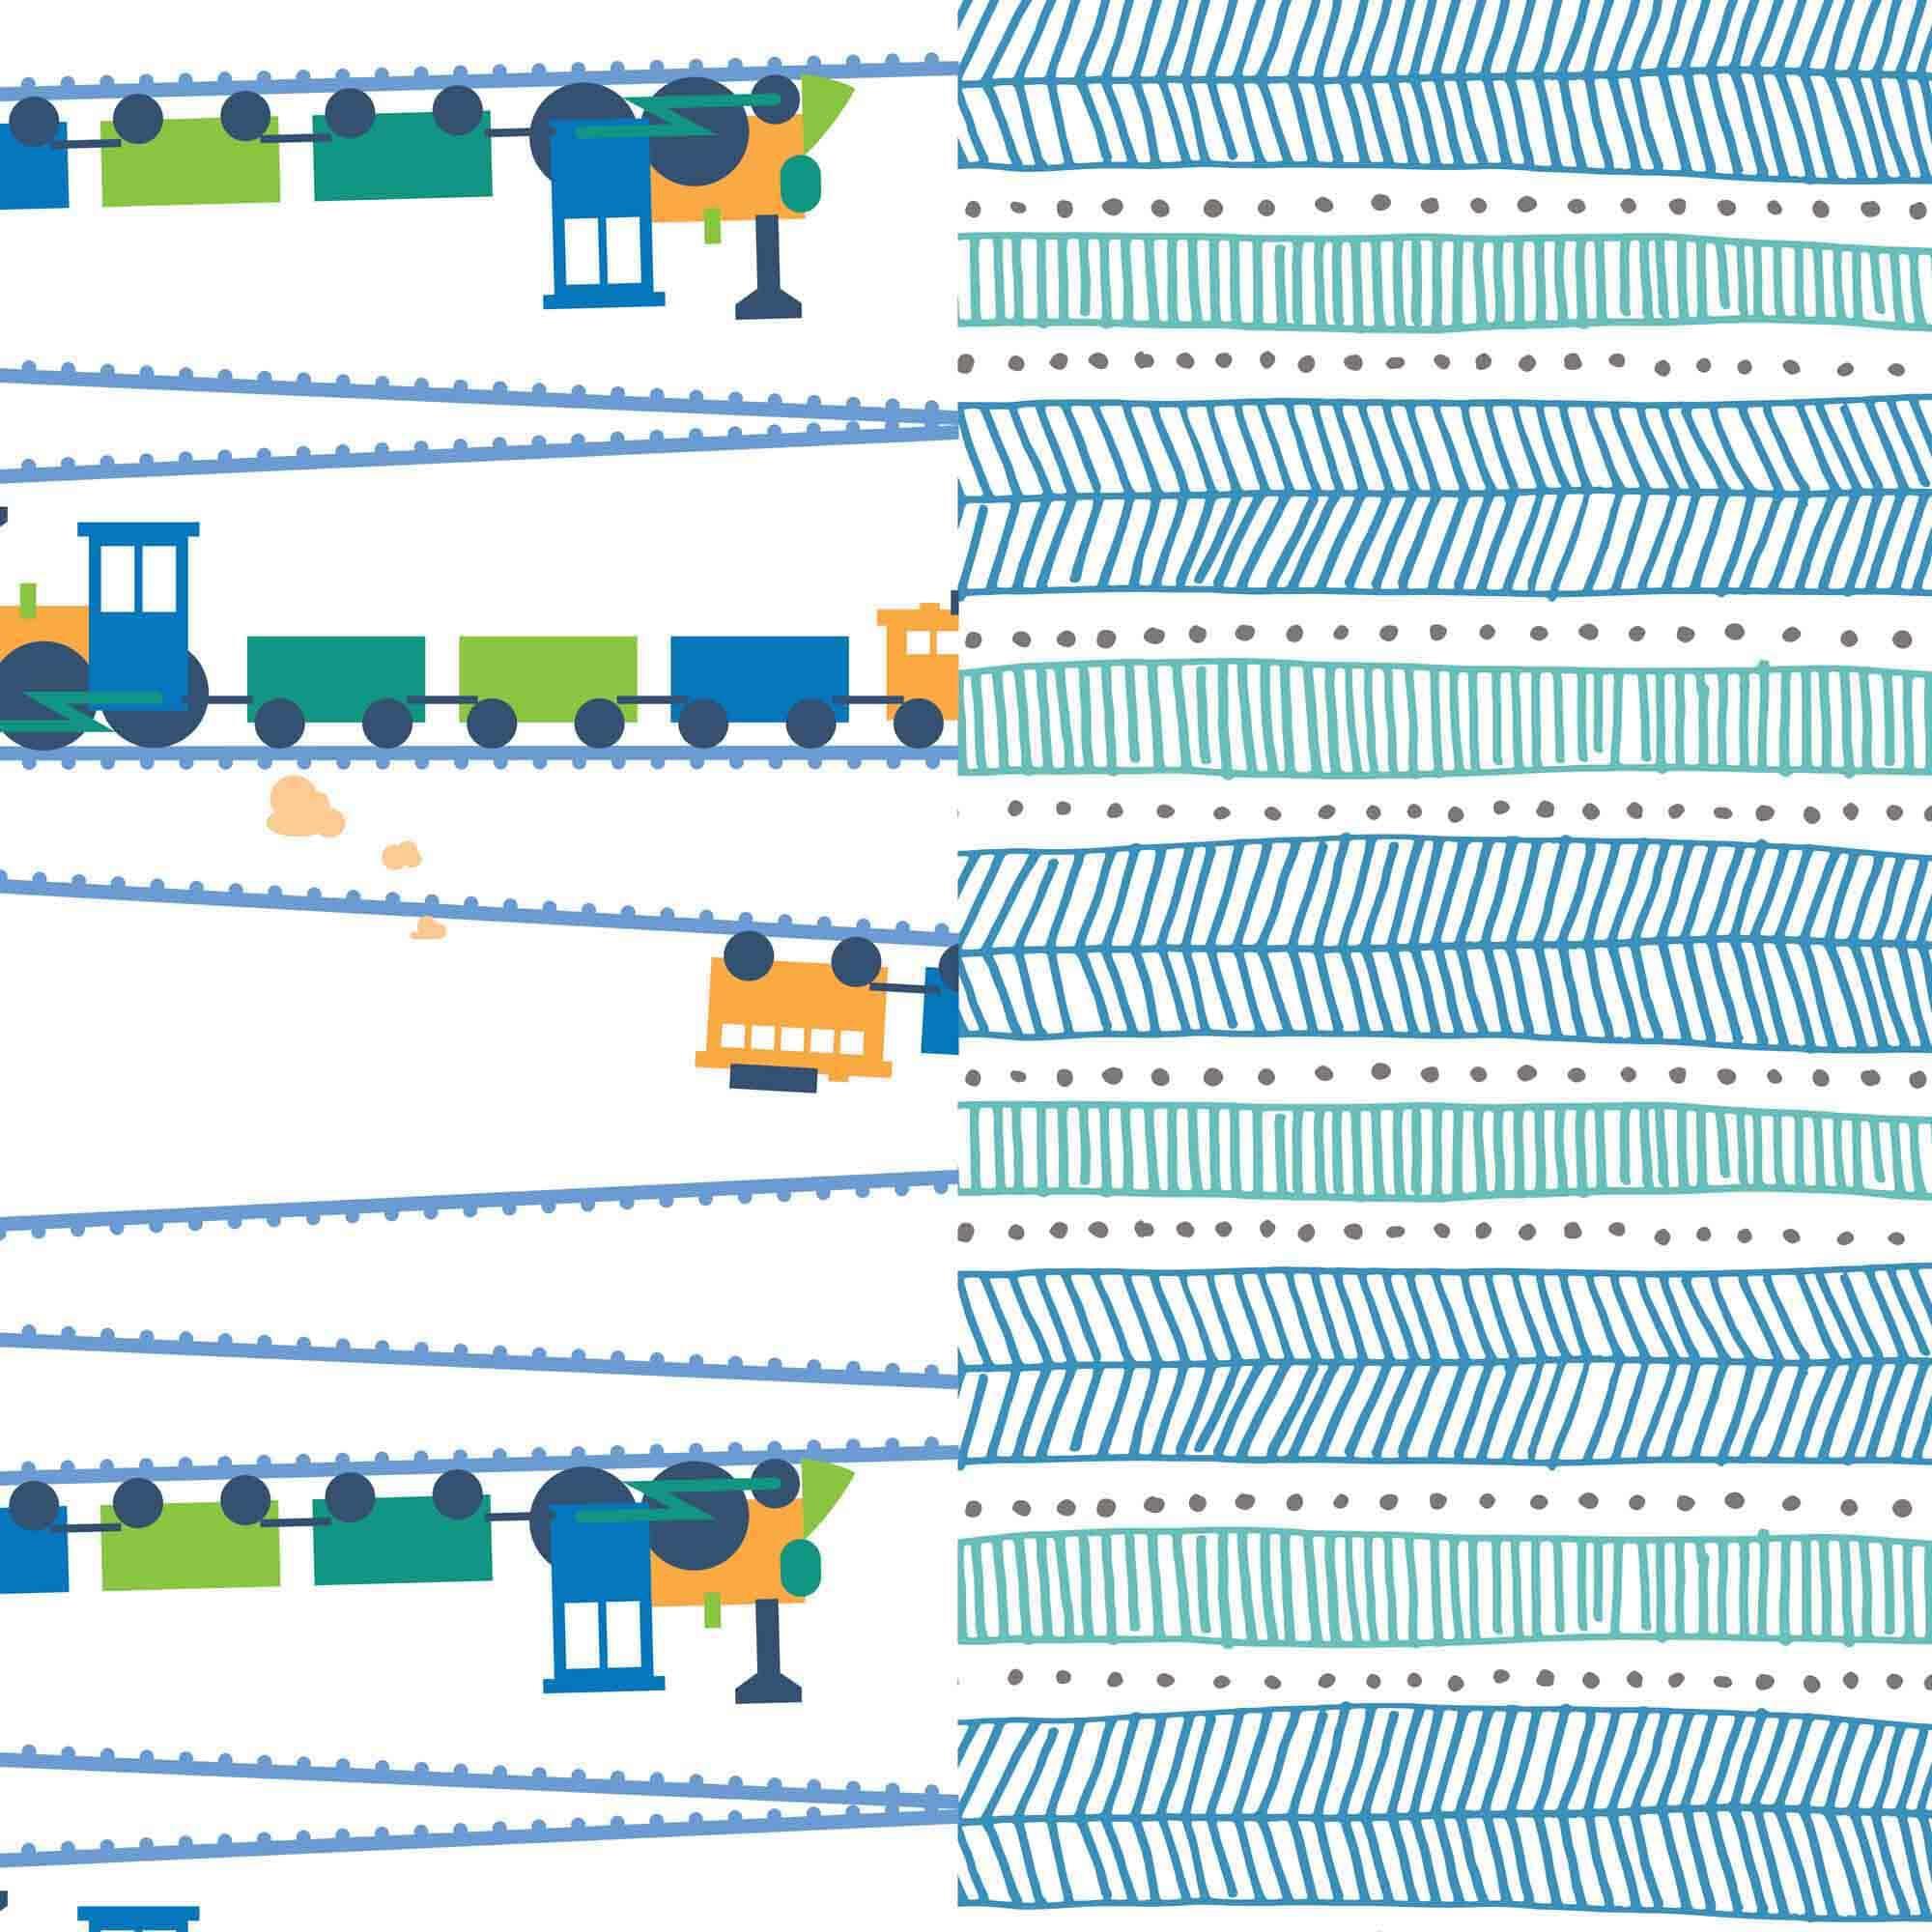 Diaper Box, Trains + Teal Tribal, Size 5